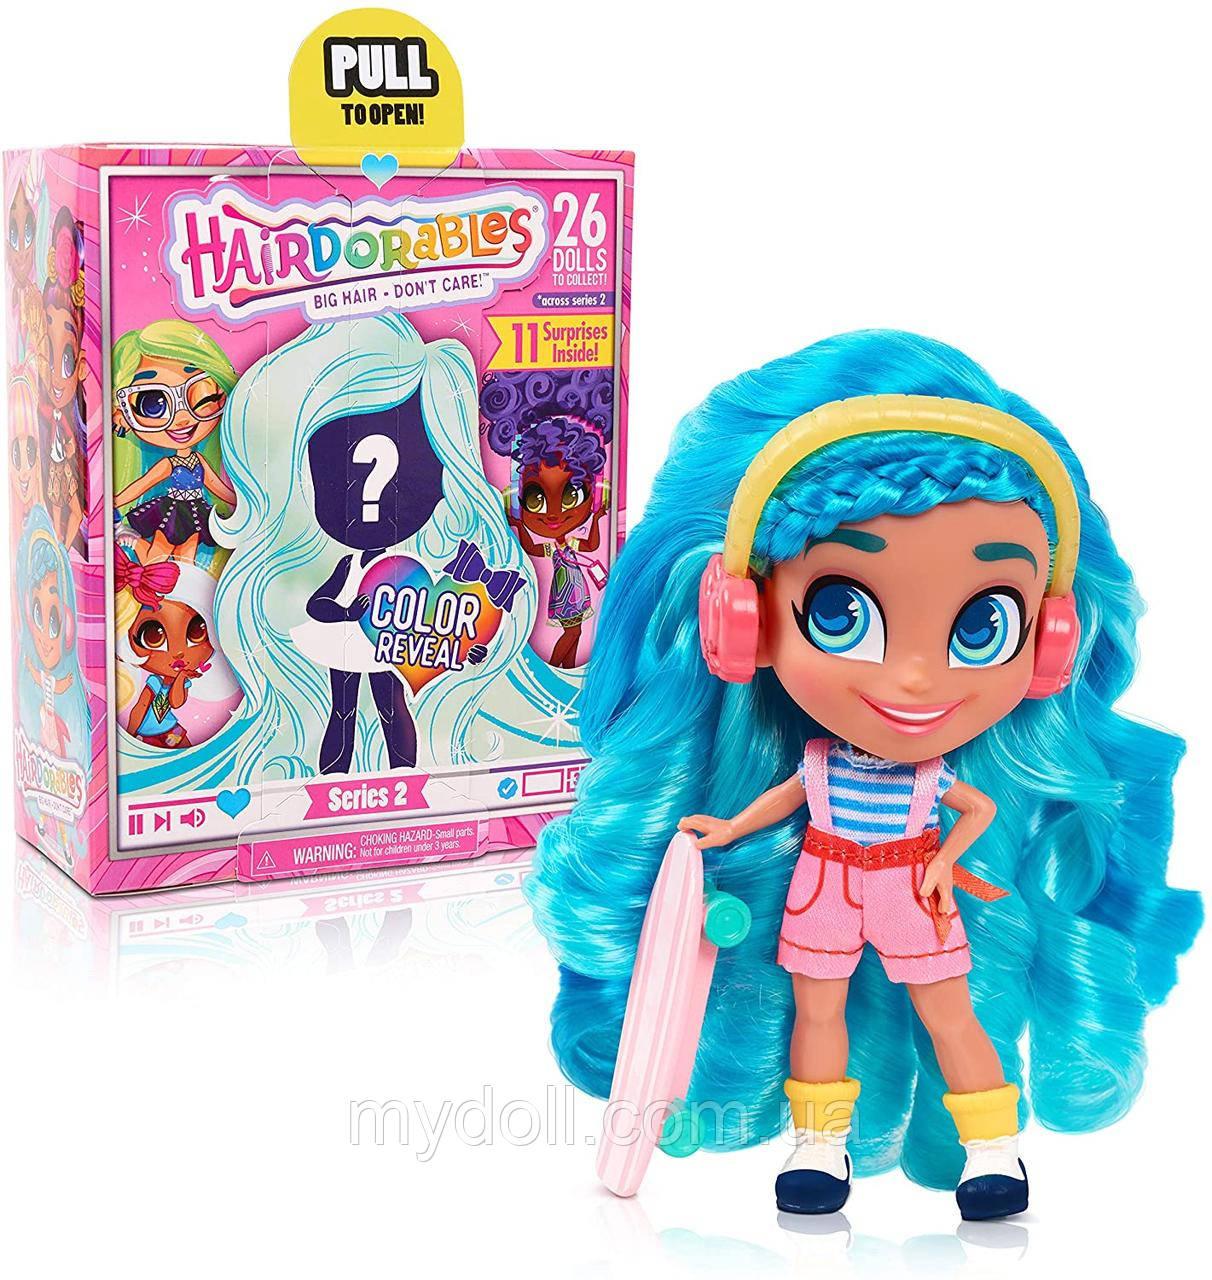 Лялька Hairdorables 2 серія Collectible Surprise Dolls Хердораблс сюрприз Оригінал